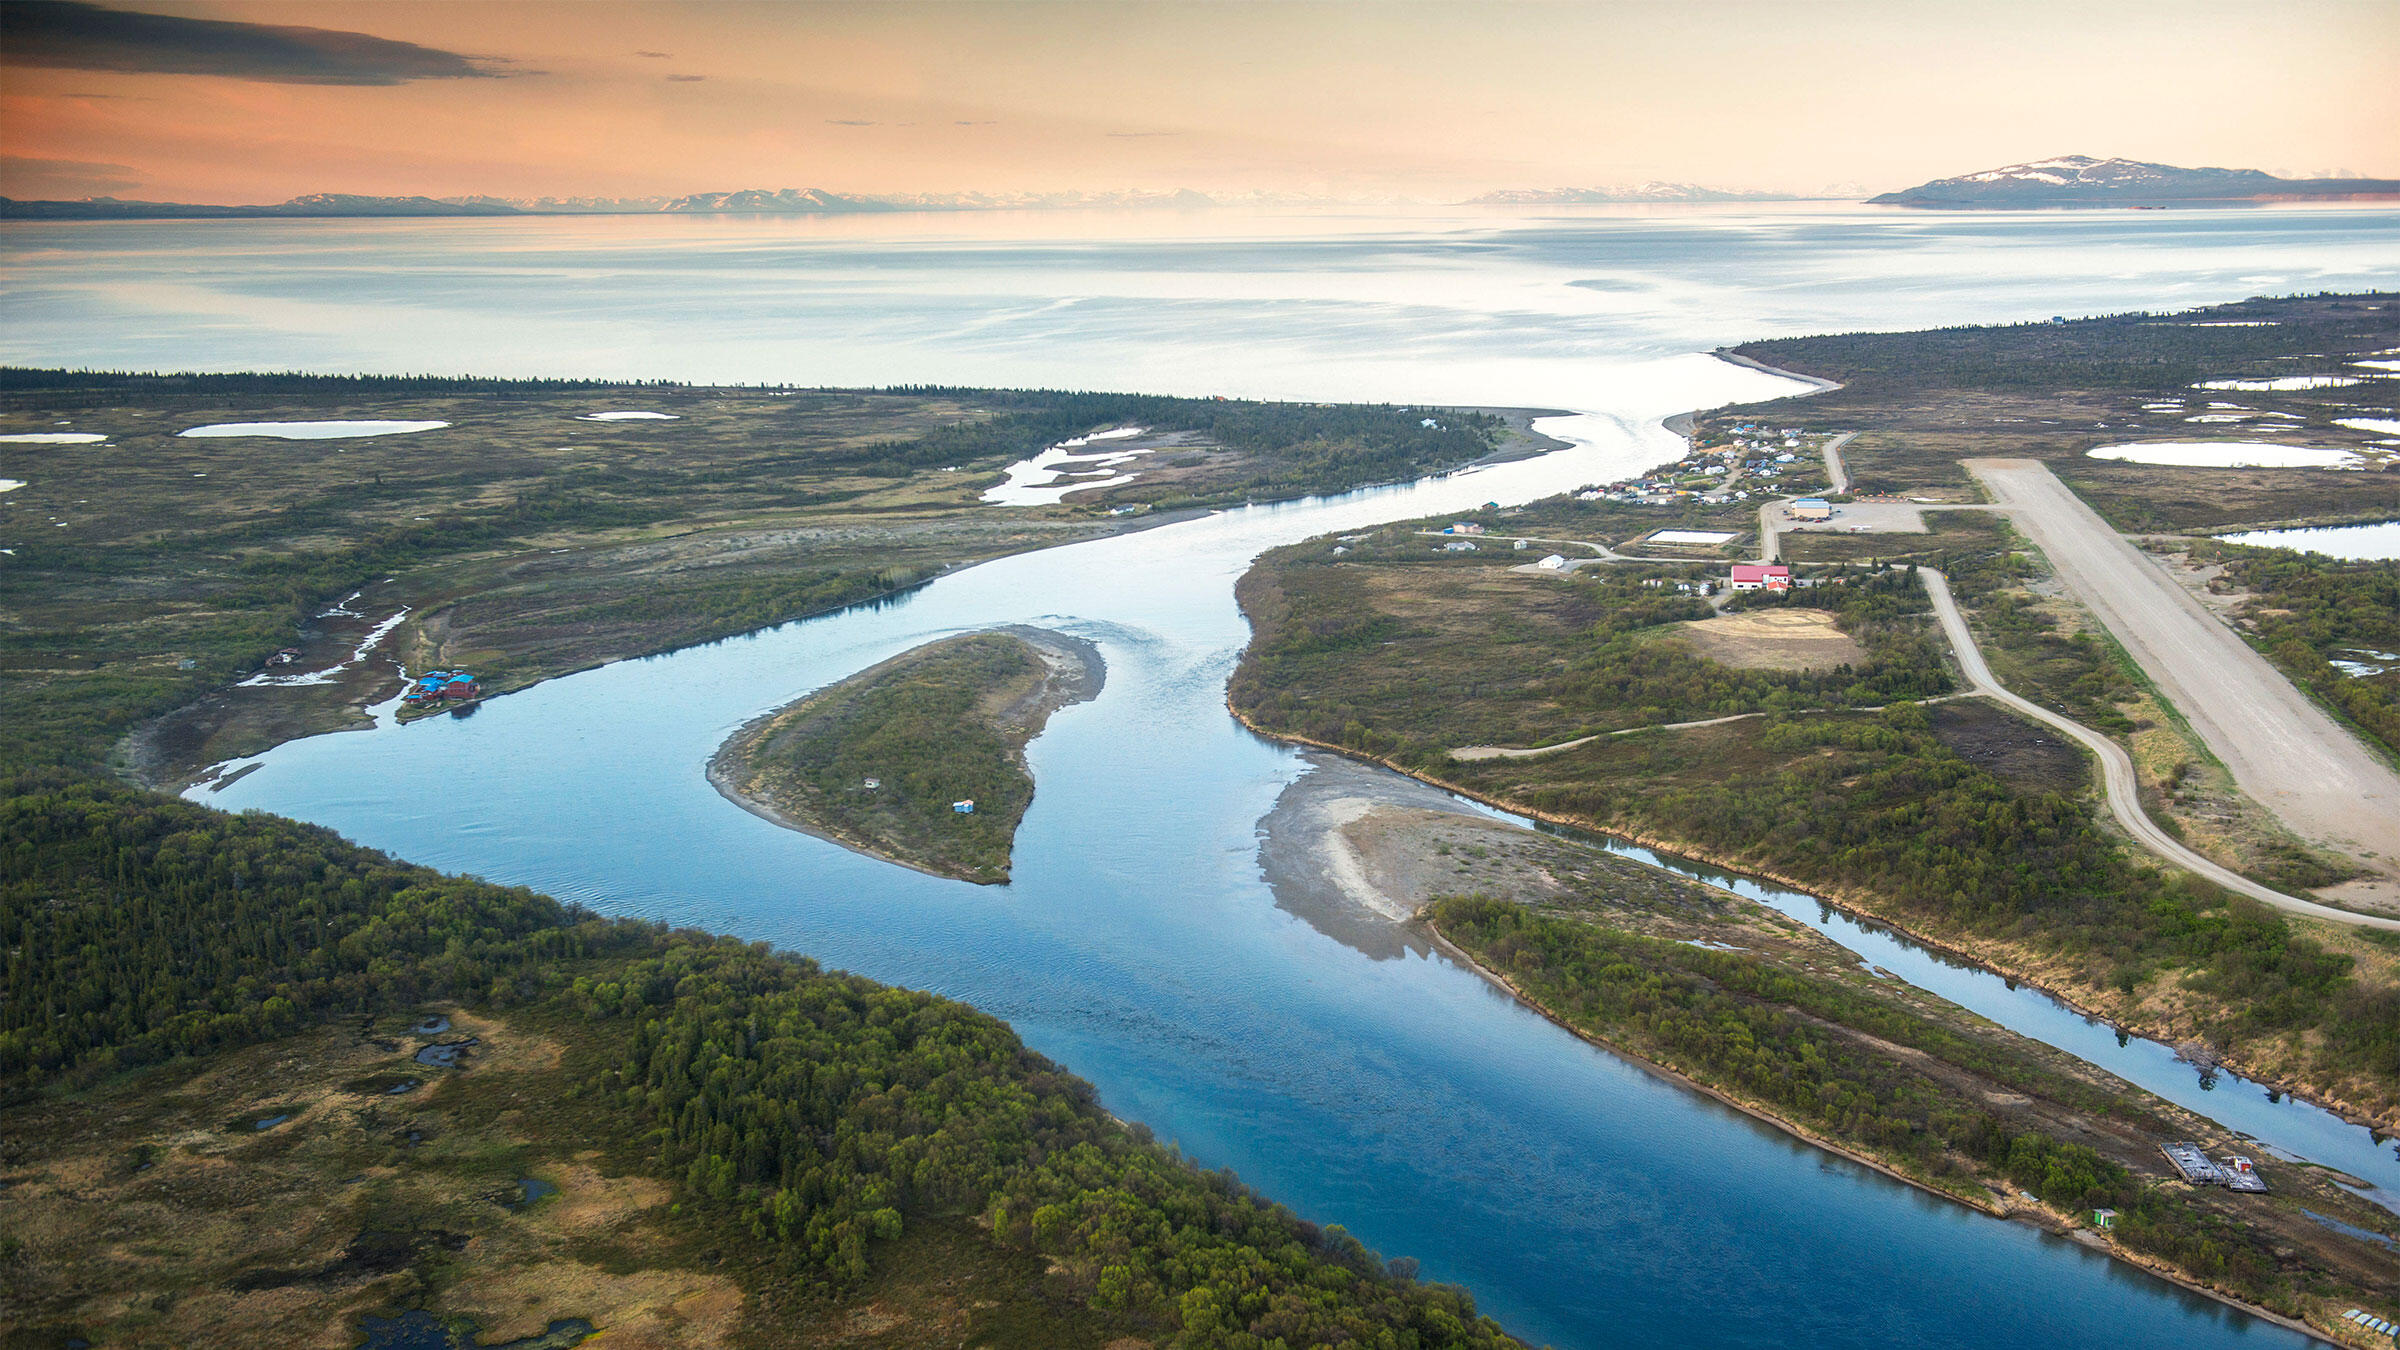 Kvichak River and the village of Igiugig on Lake Iliamna, Bristol Bay, Alaska. Design Pics Inc/Alamy